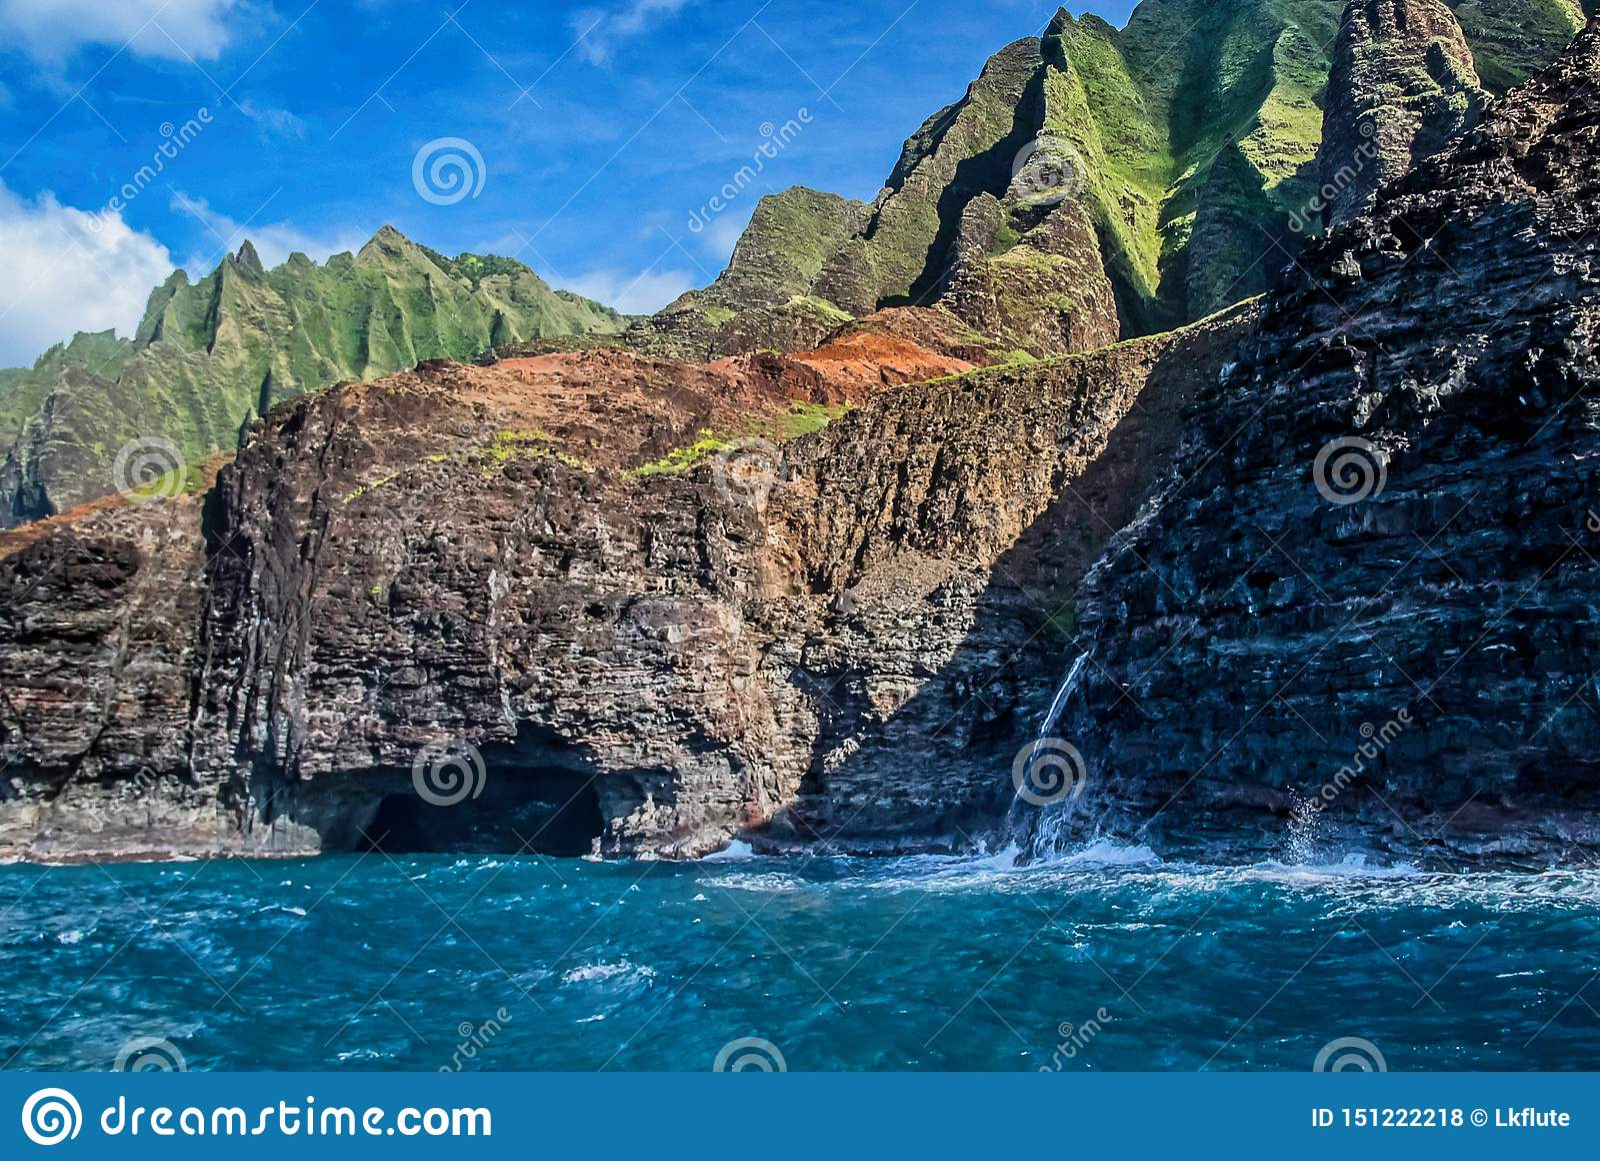 Schönes Na Pai Coast von Kauai